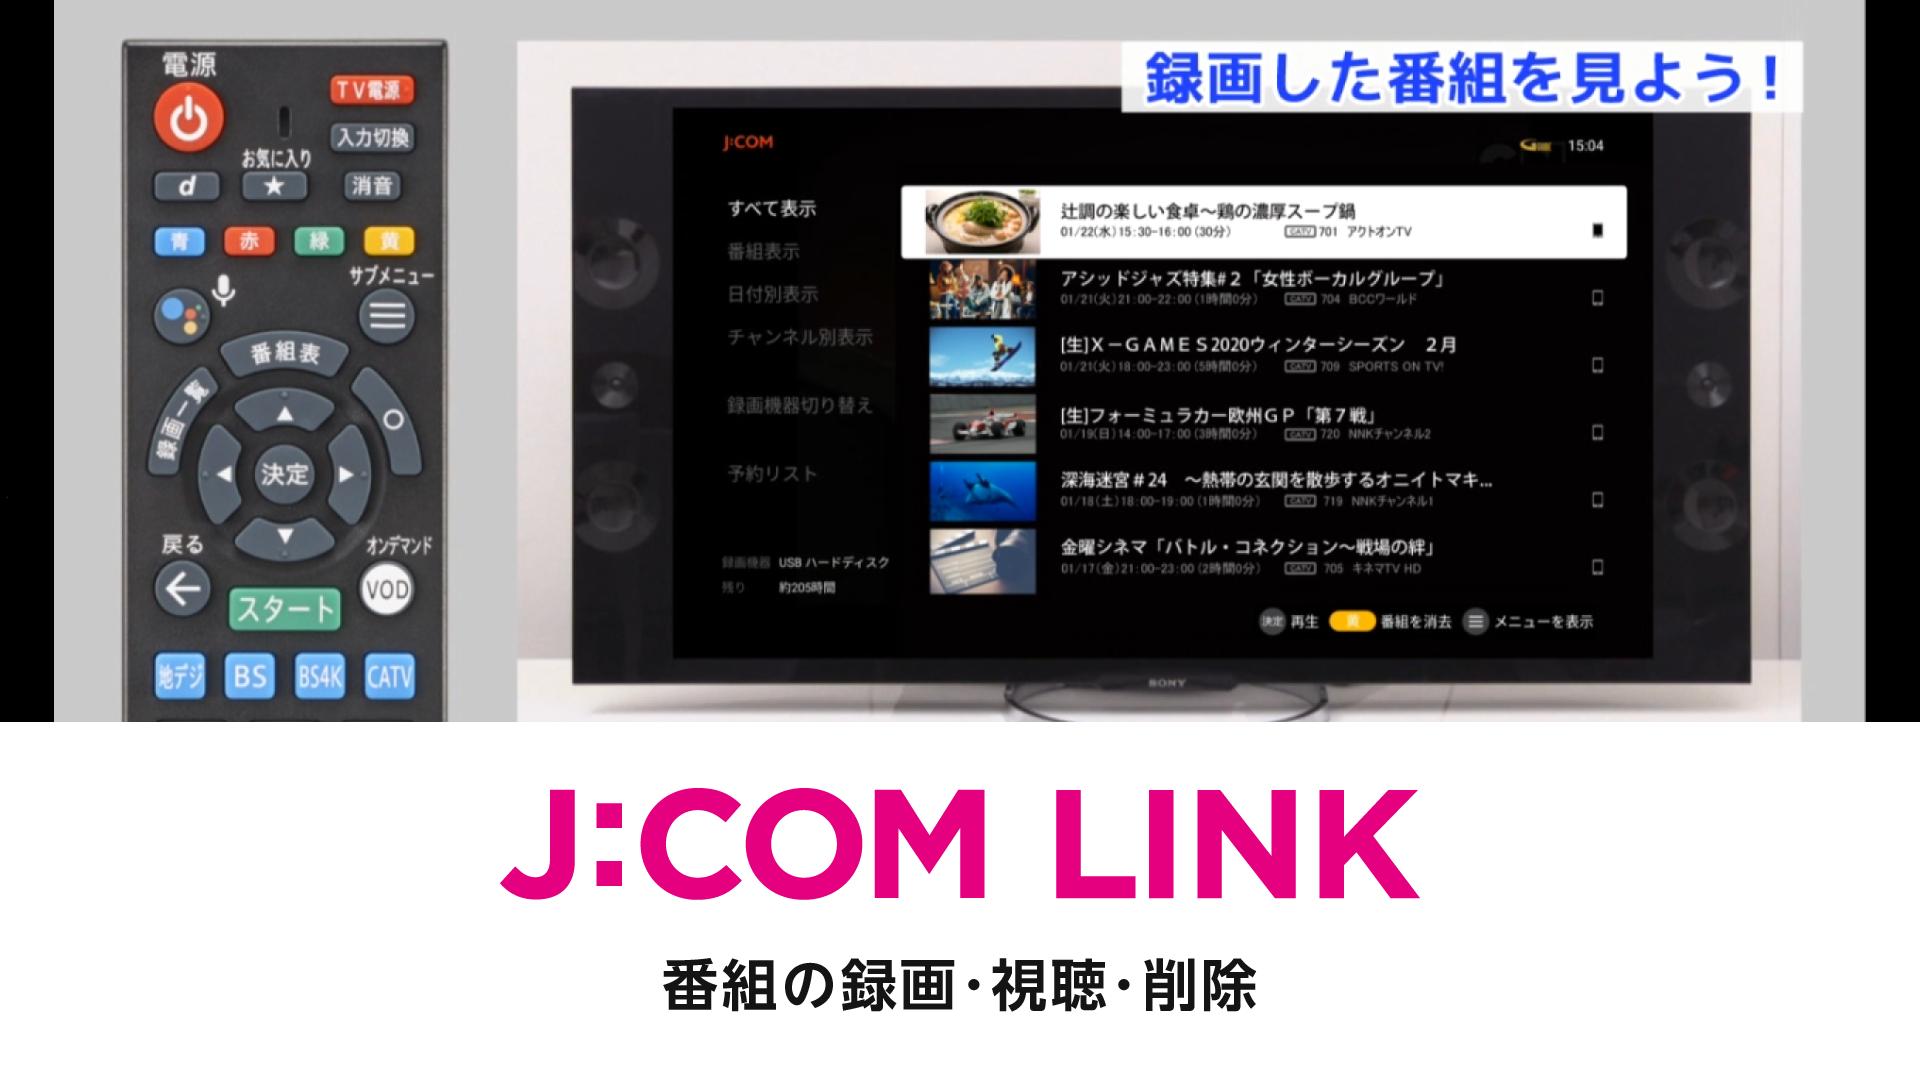 J:COM LINK - 音声で番組を見る・探す(動画)